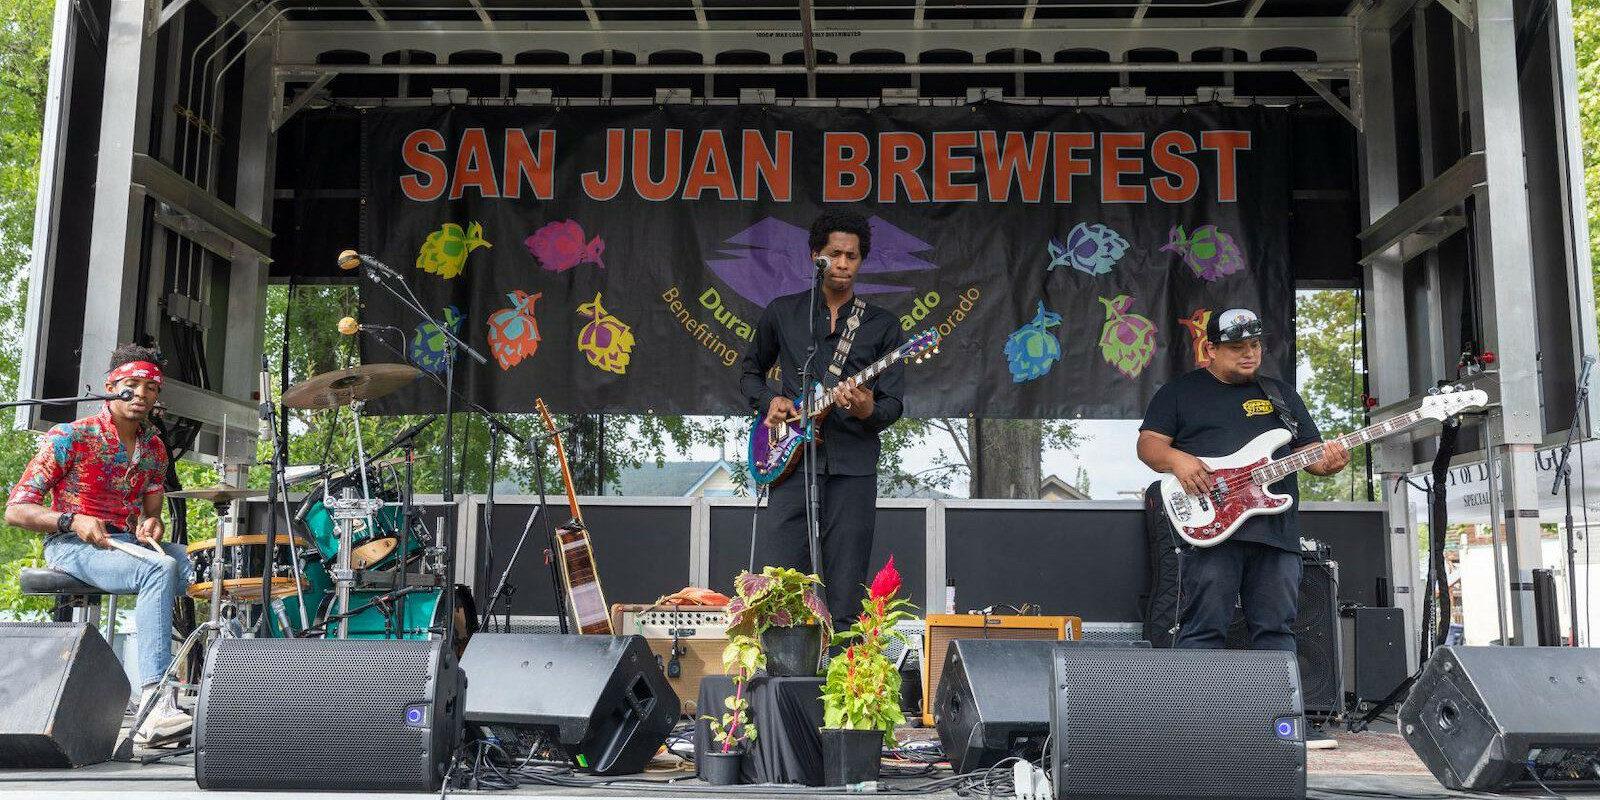 Image of a performer at the San Juan Brewfest in Durango, Colorado